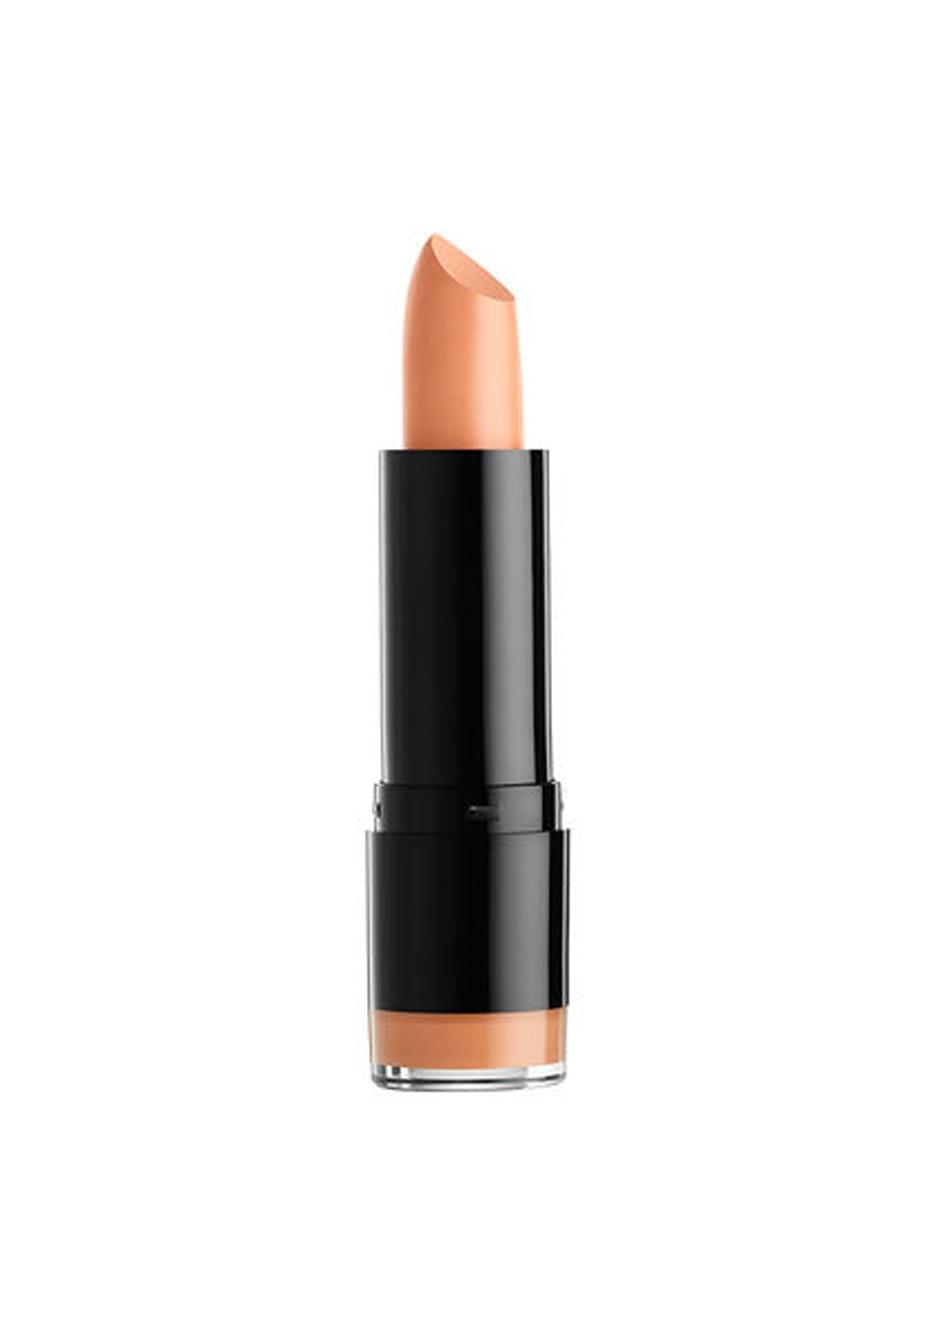 NYX Extra Creamy Round Lipstick - LSS588 Orange Soda